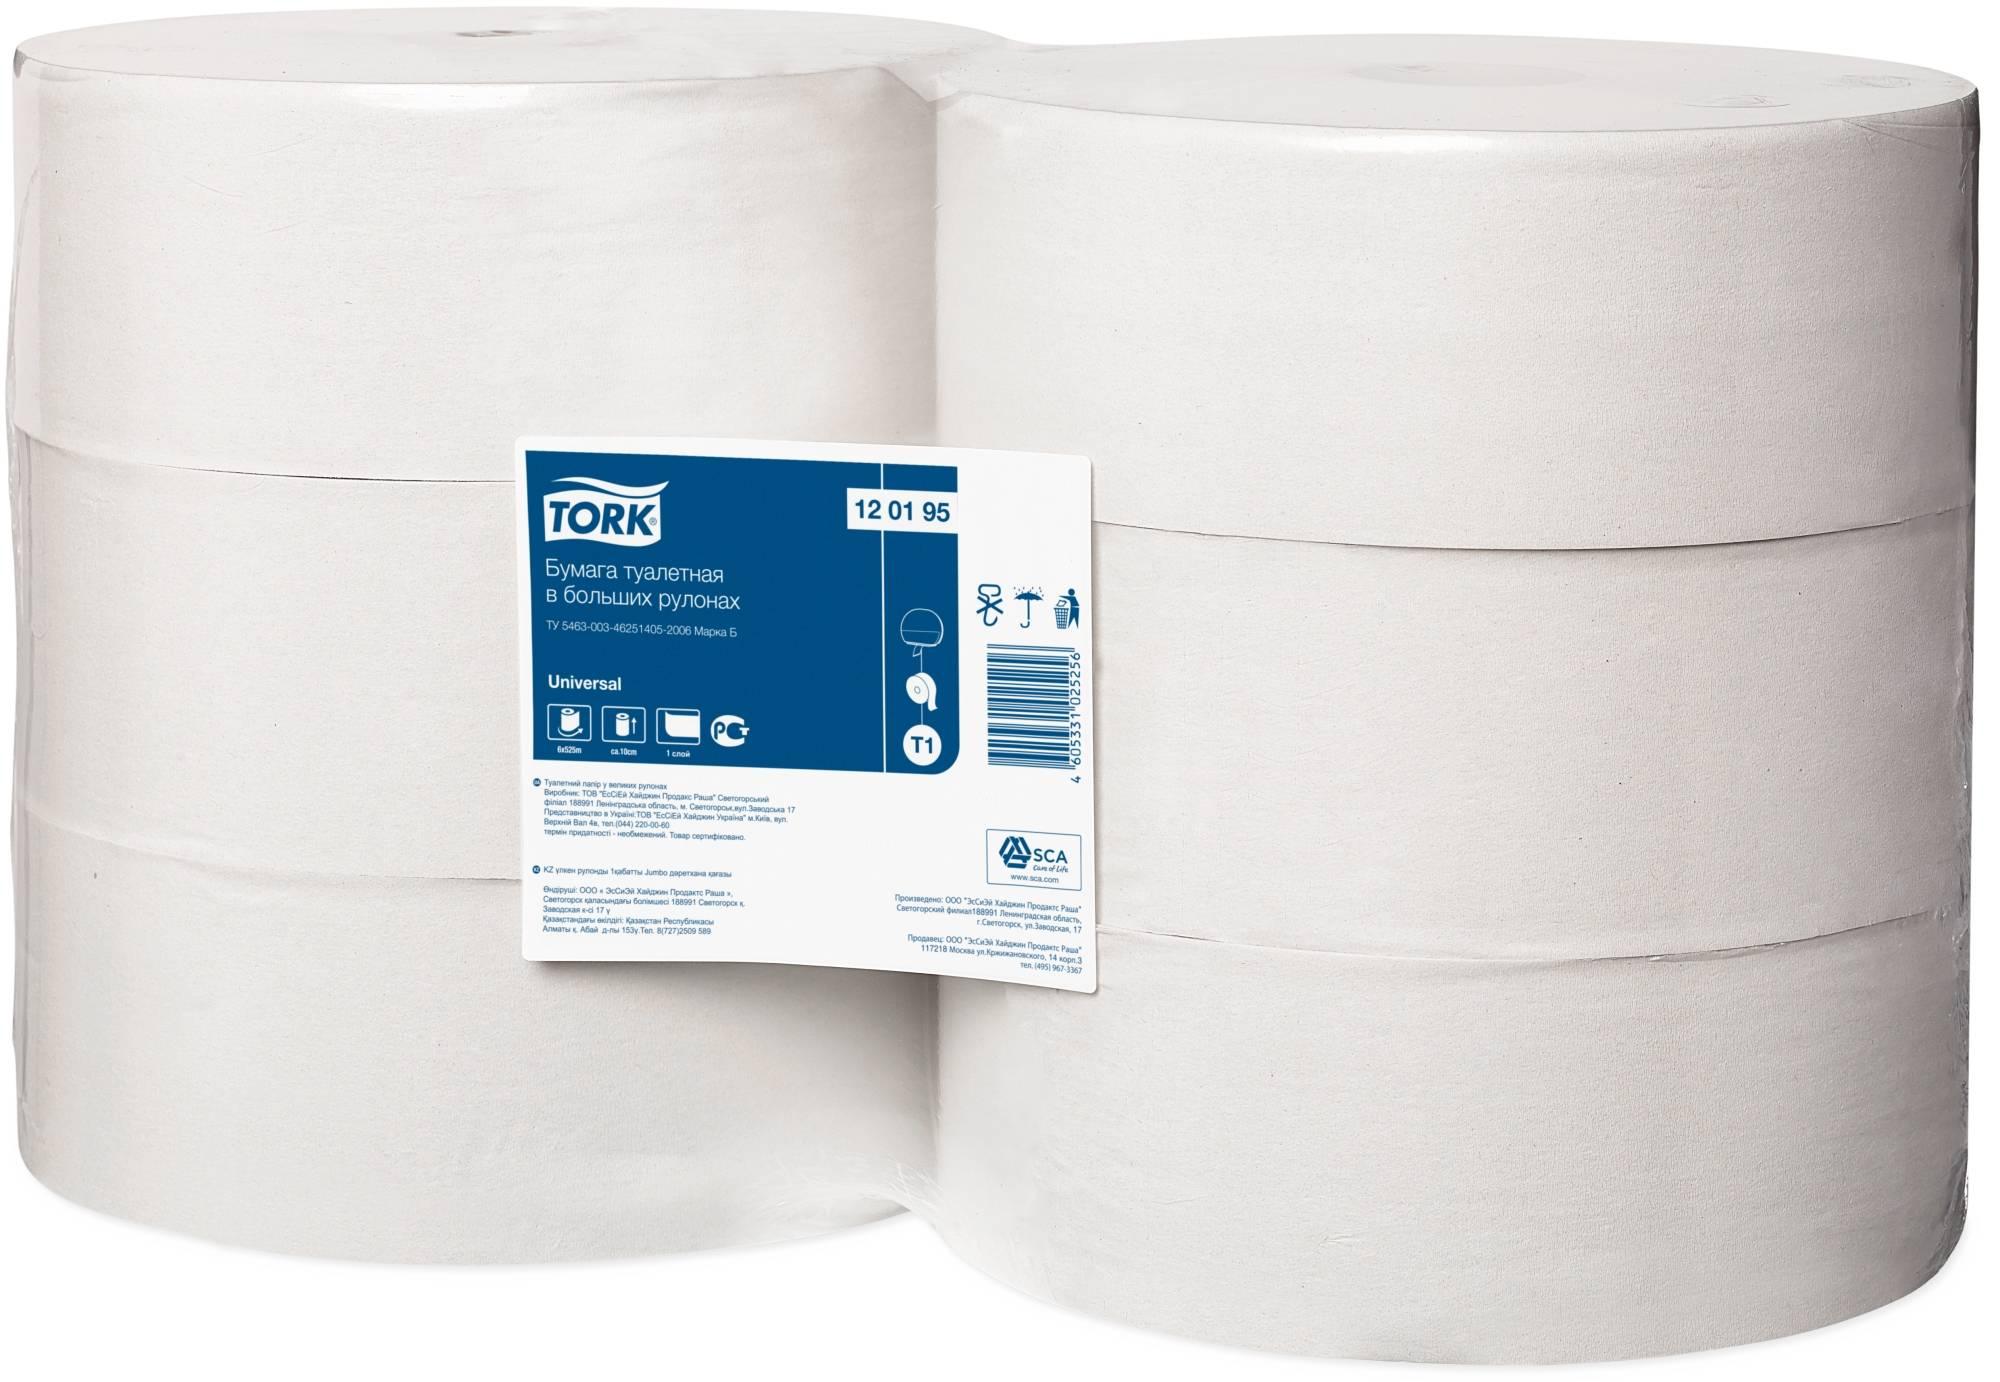 Туалетная бумага, TORK UNIVERSAL T1, 1 слойная, без перфорации, 525 м натур.